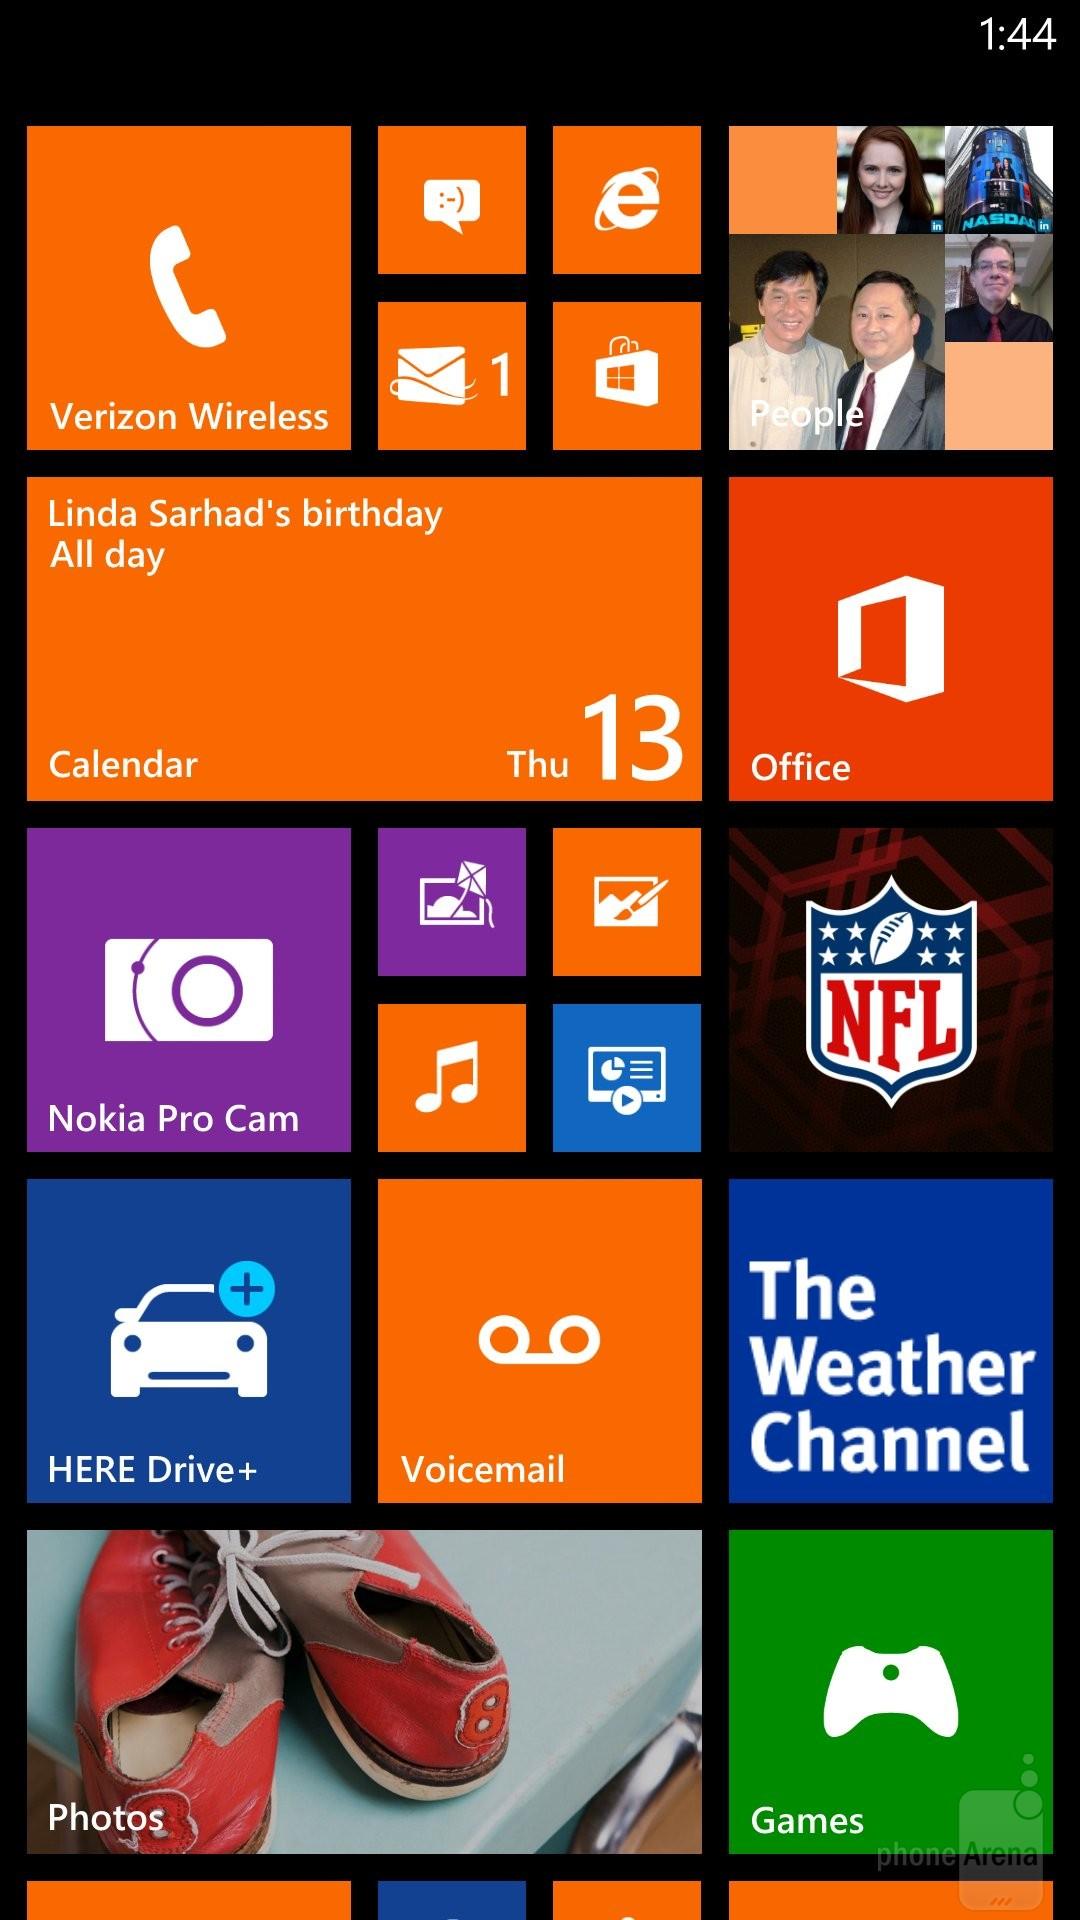 iPhone 5S vs Nokia Lumia Icon